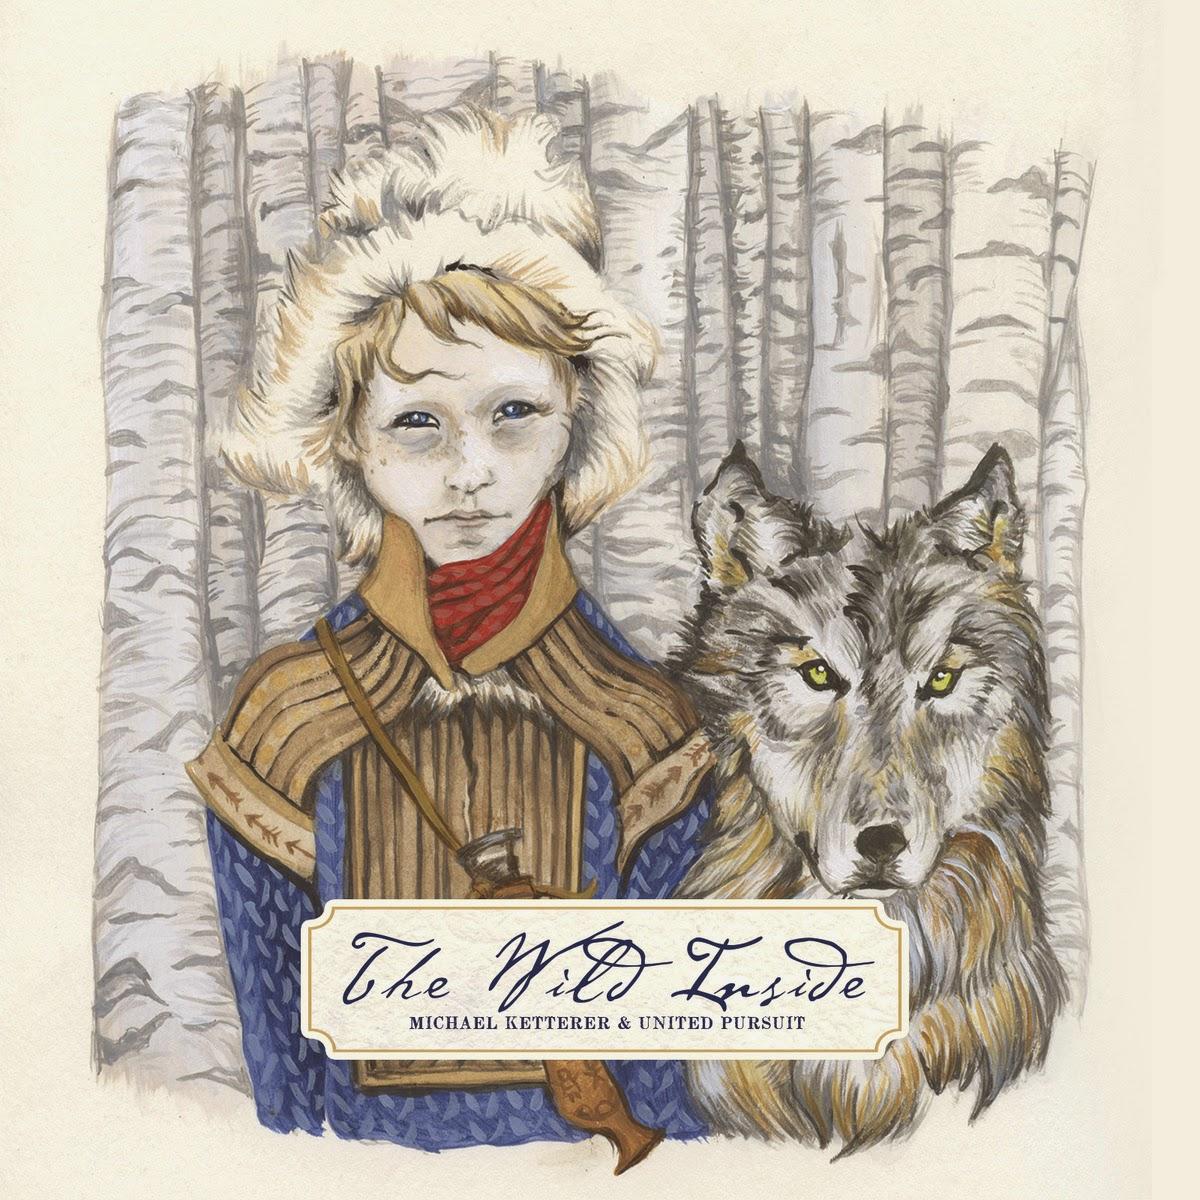 Michael Ketterer & United Pursuit - The Wild Inside 2014 English Christian Album Download